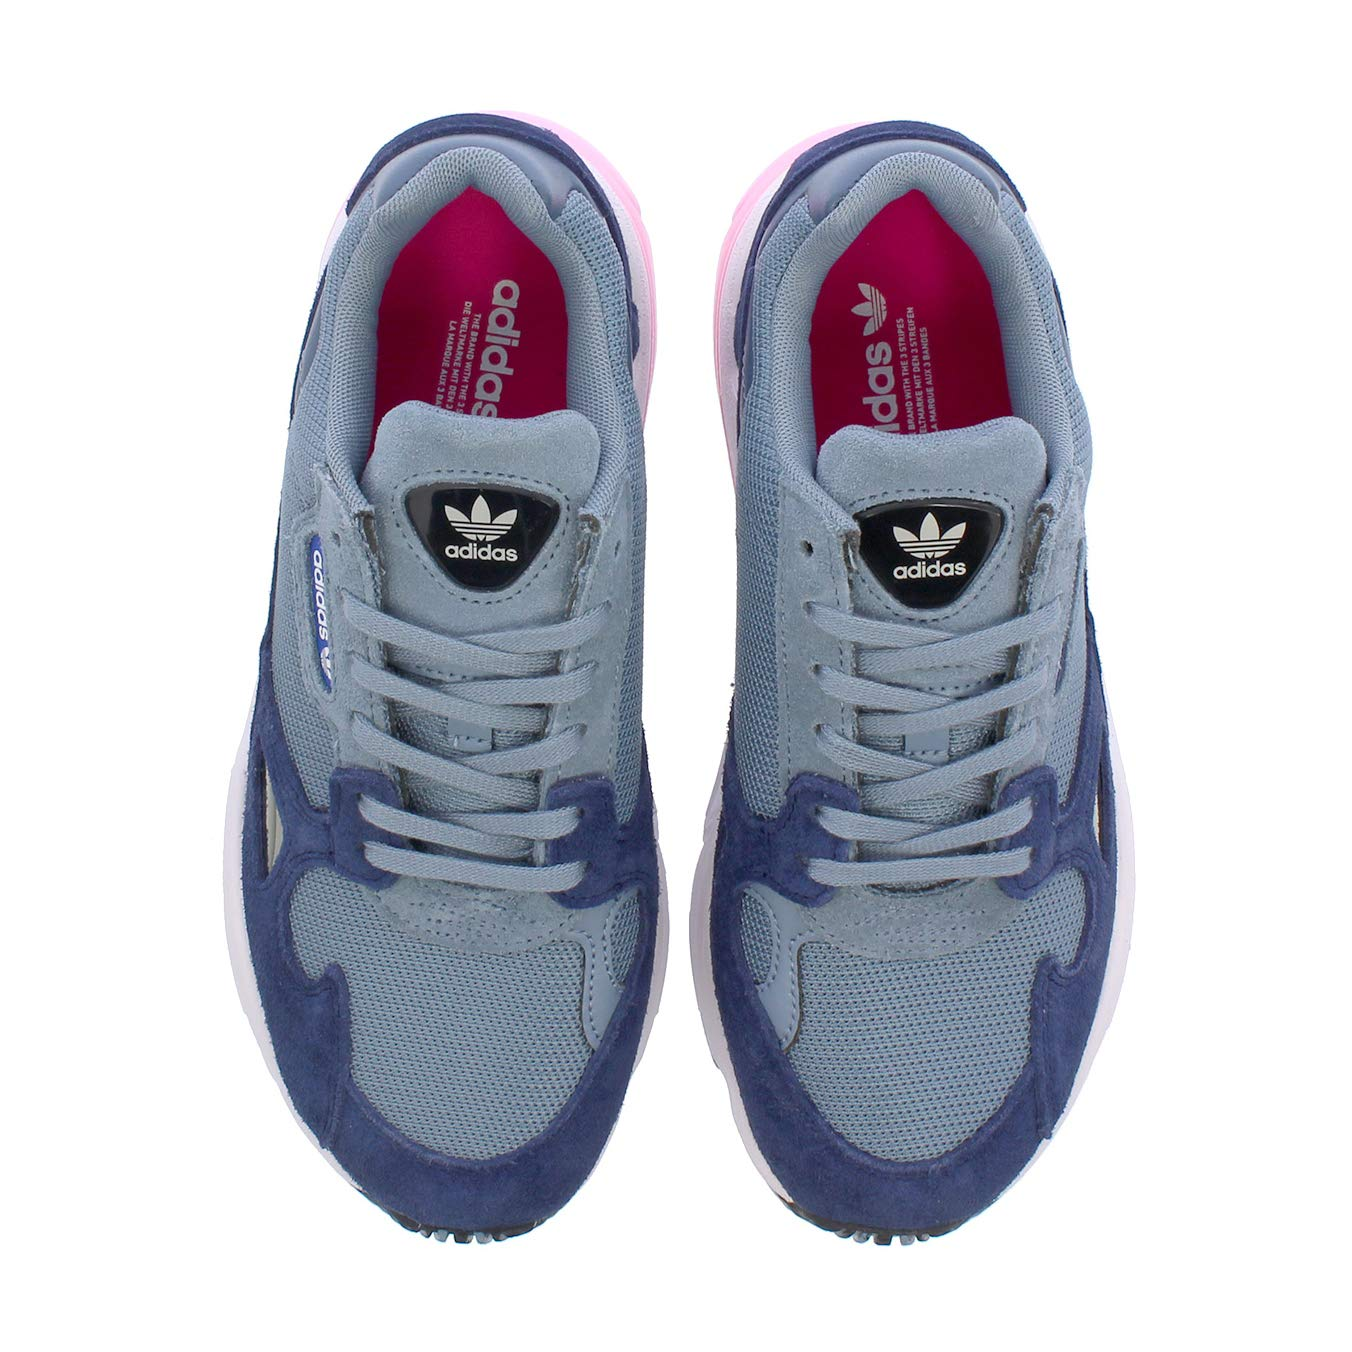 79af780acb9 adidas Originals Falcon - Women's Womens D96699 Size 10